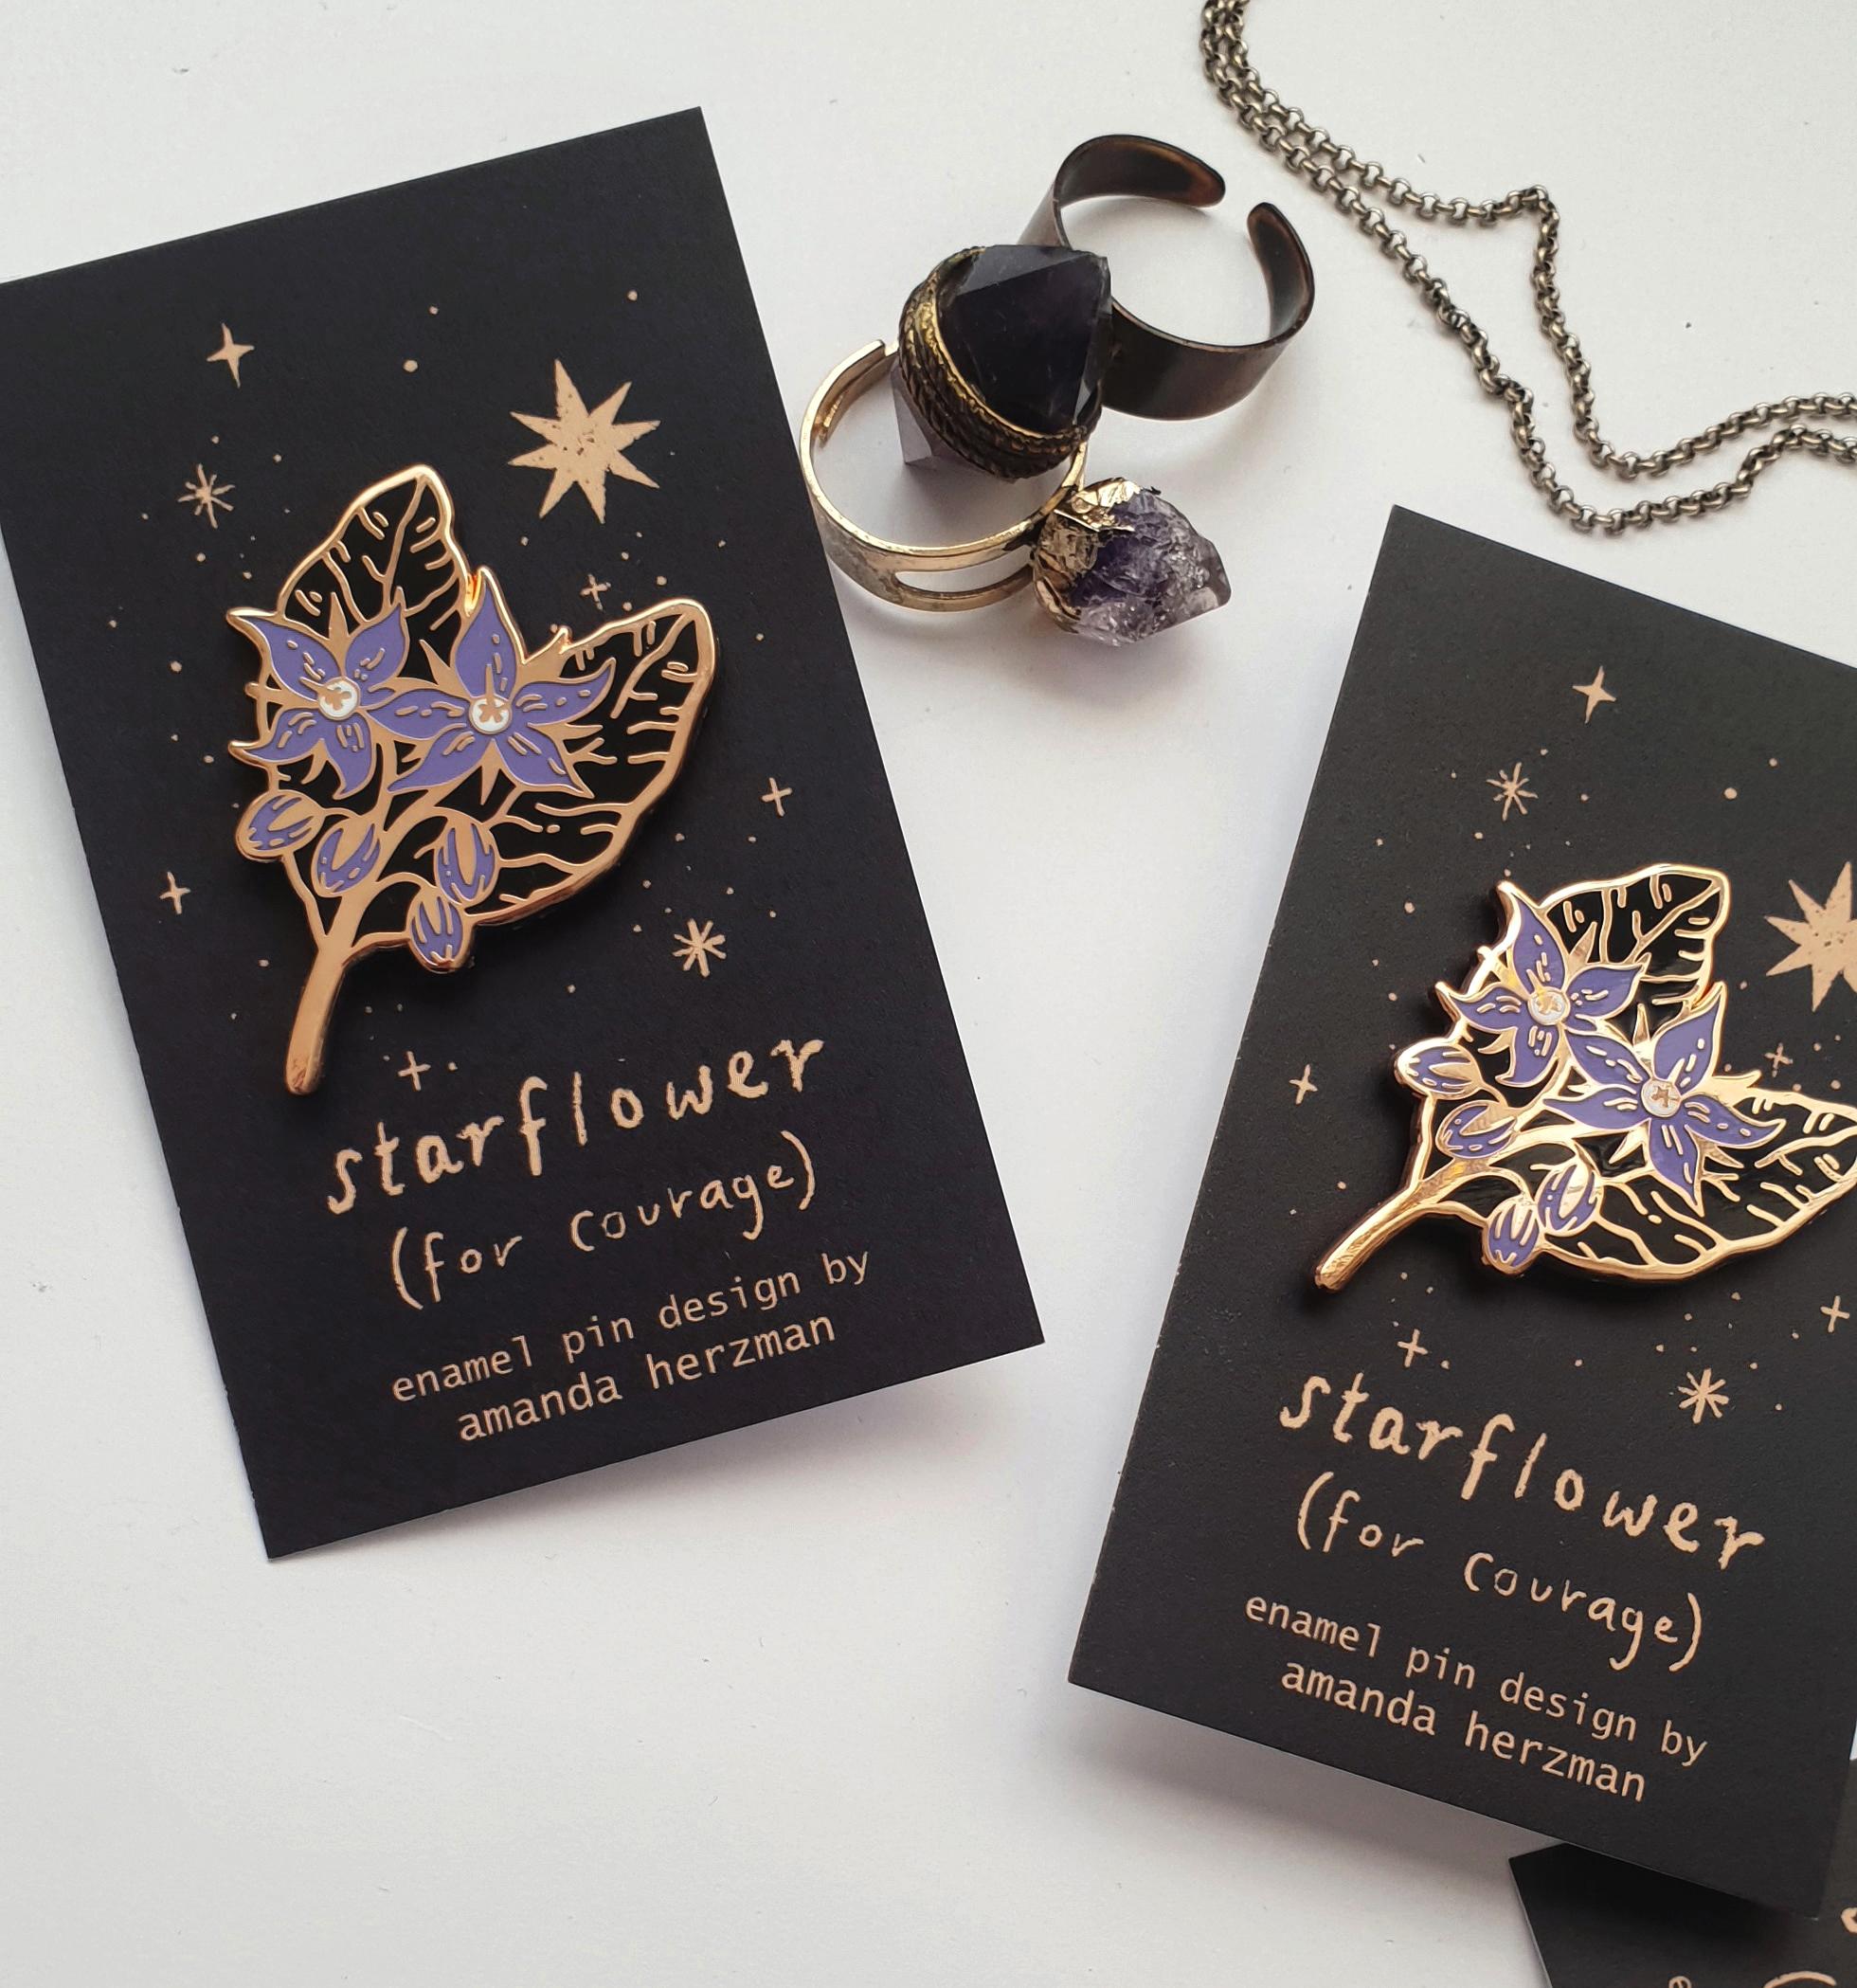 starflower enamel pin from Amanda Herzman